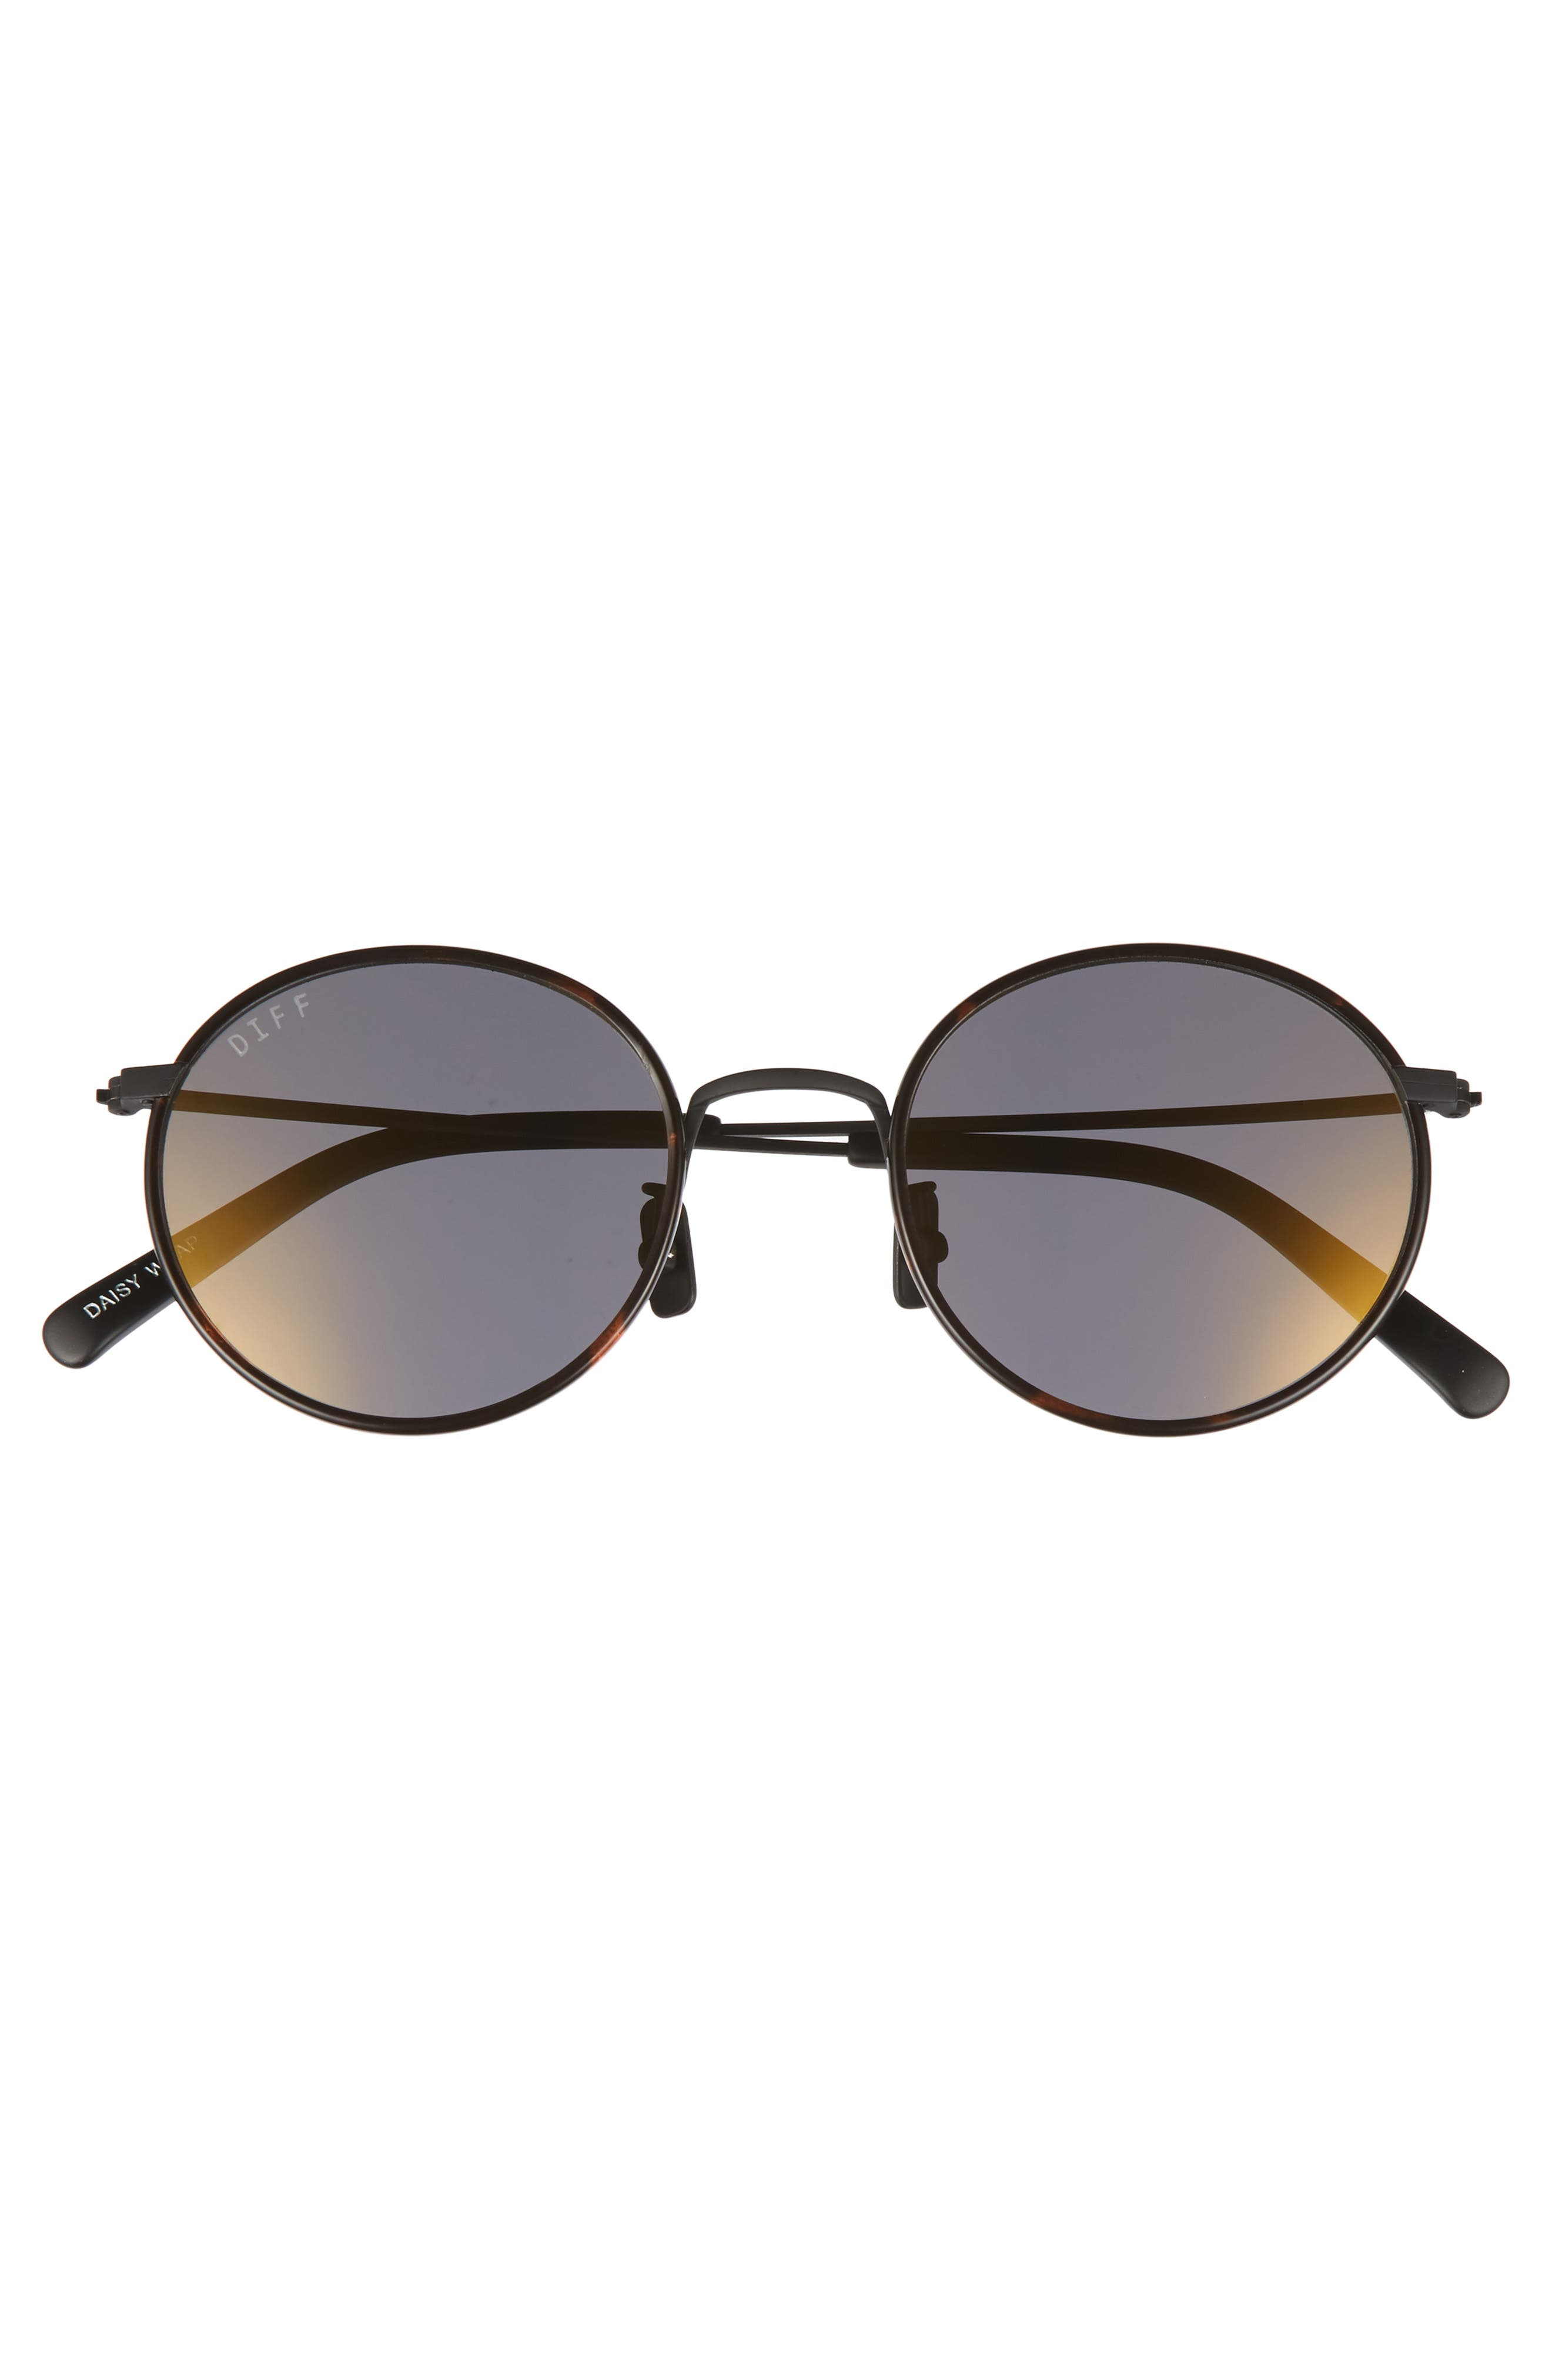 Daisy 57mm Polarized Round Lens Sunglasses,                             Alternate thumbnail 3, color,                             Matte Black/ Grey Blue